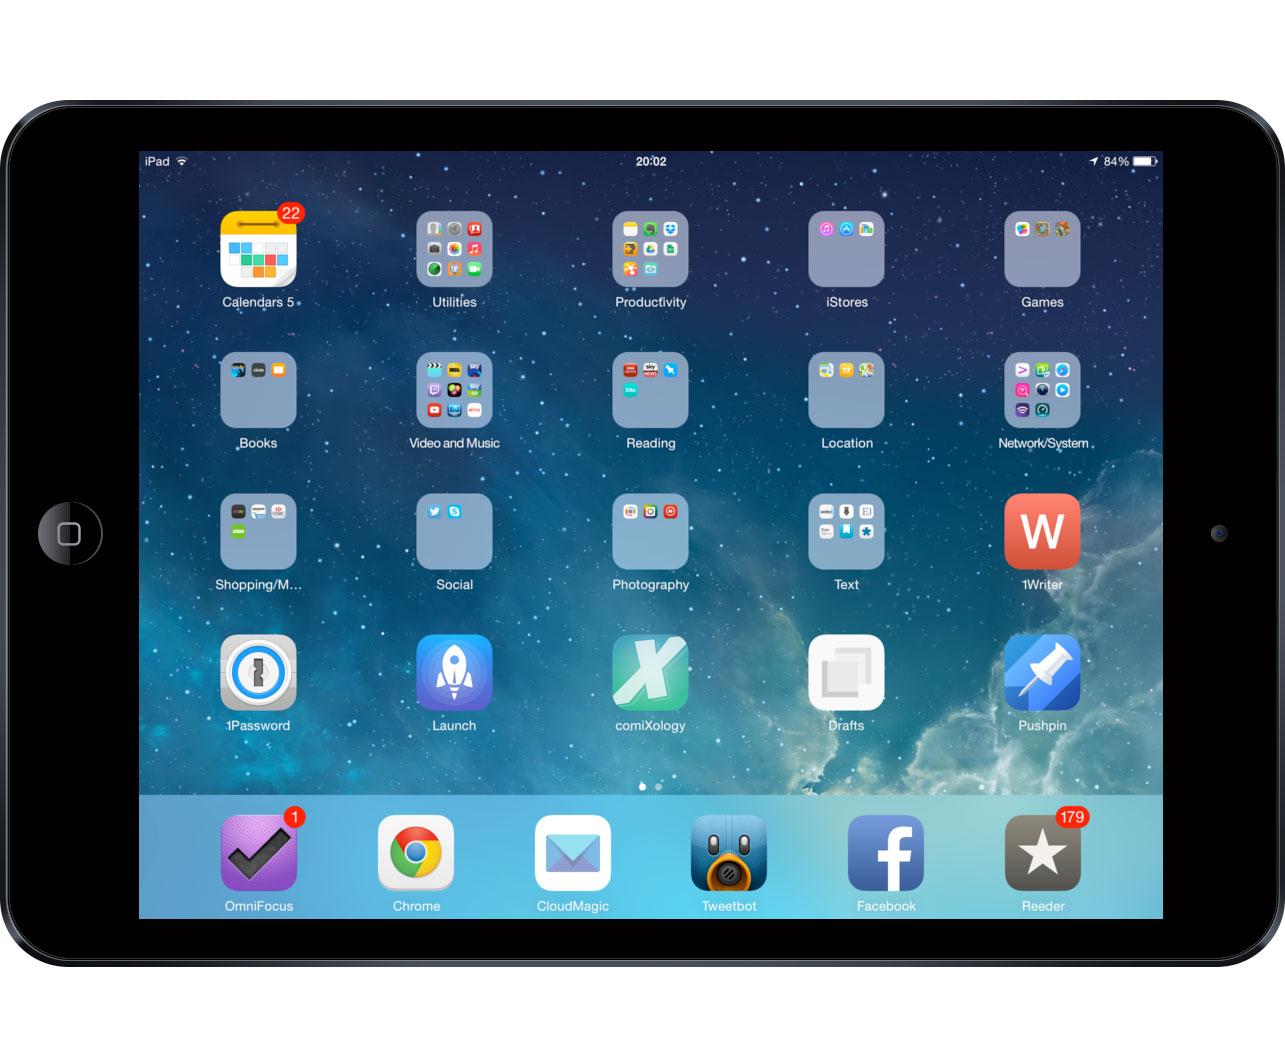 Oliver's iPad setup